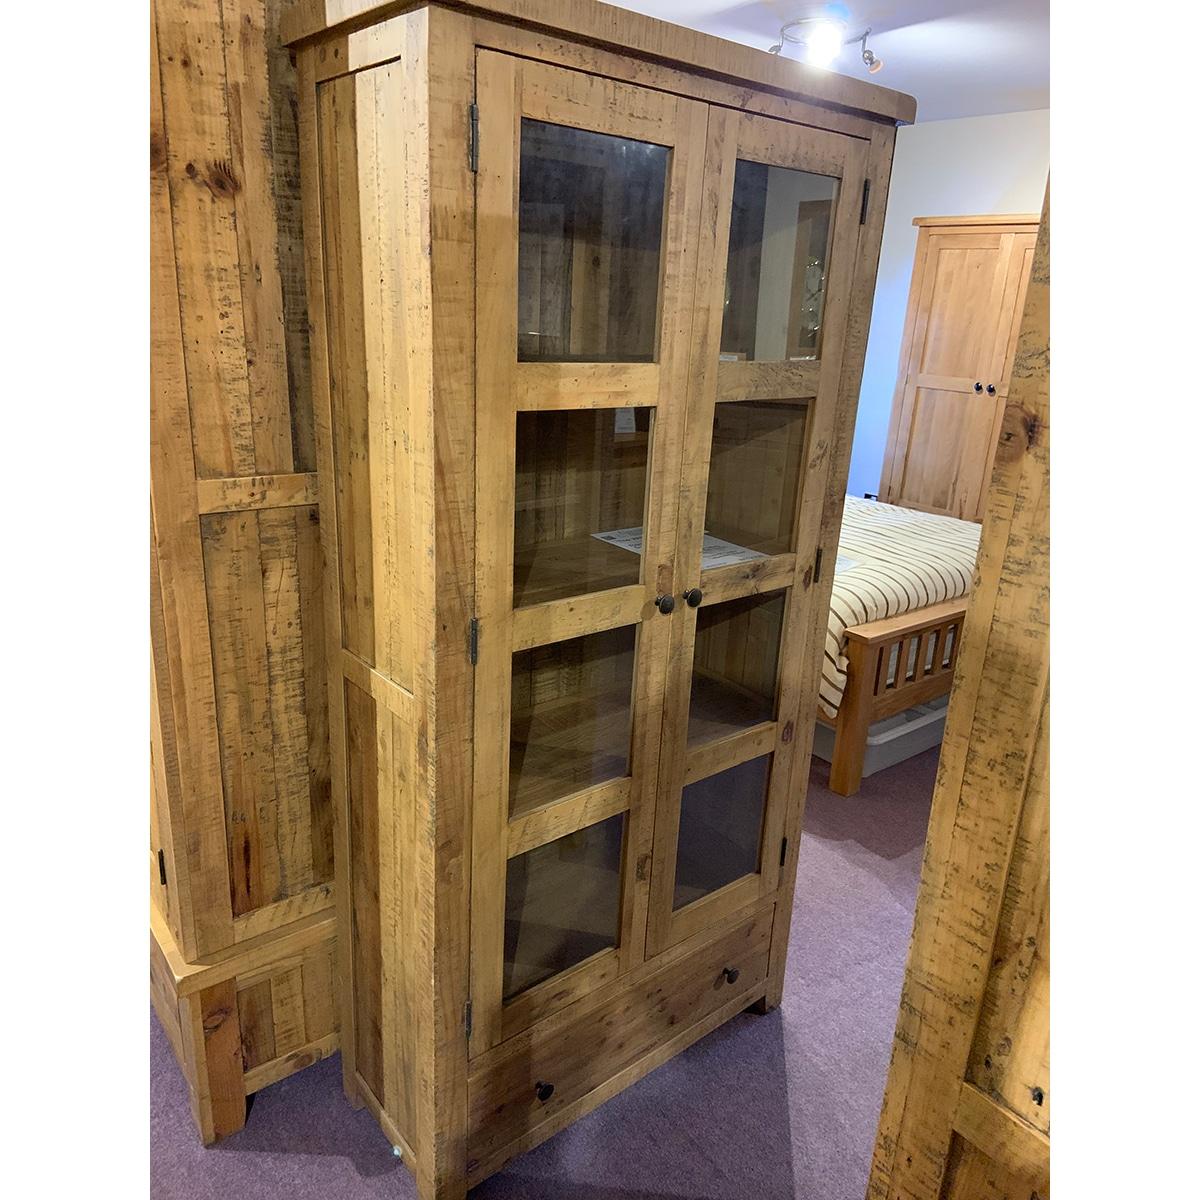 The Witterings Display Cabinet - WIT2706N